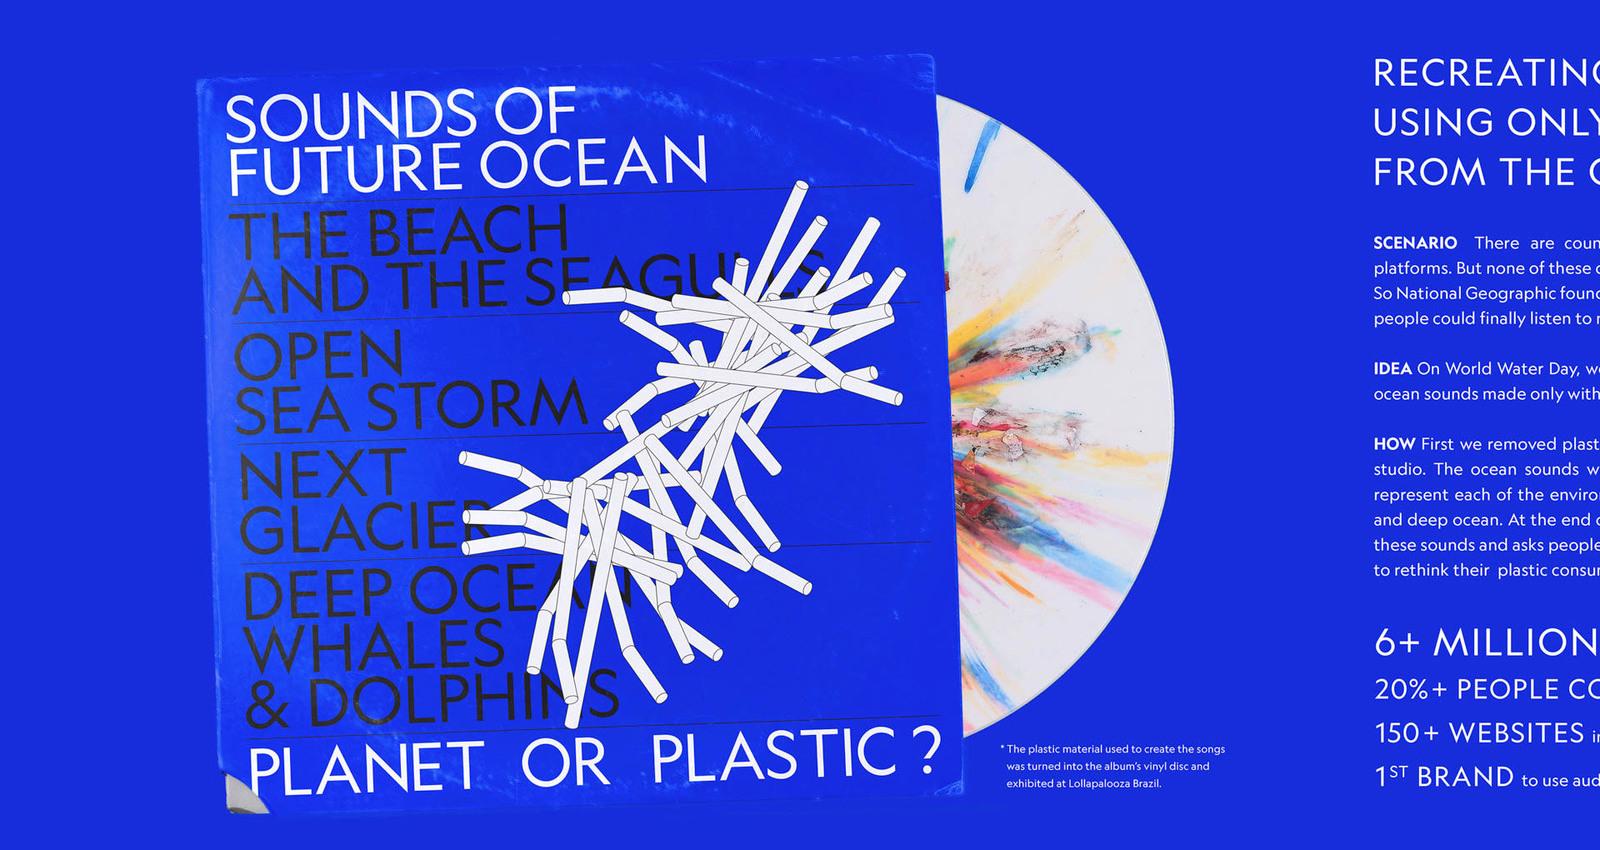 Sounds of Future Ocean